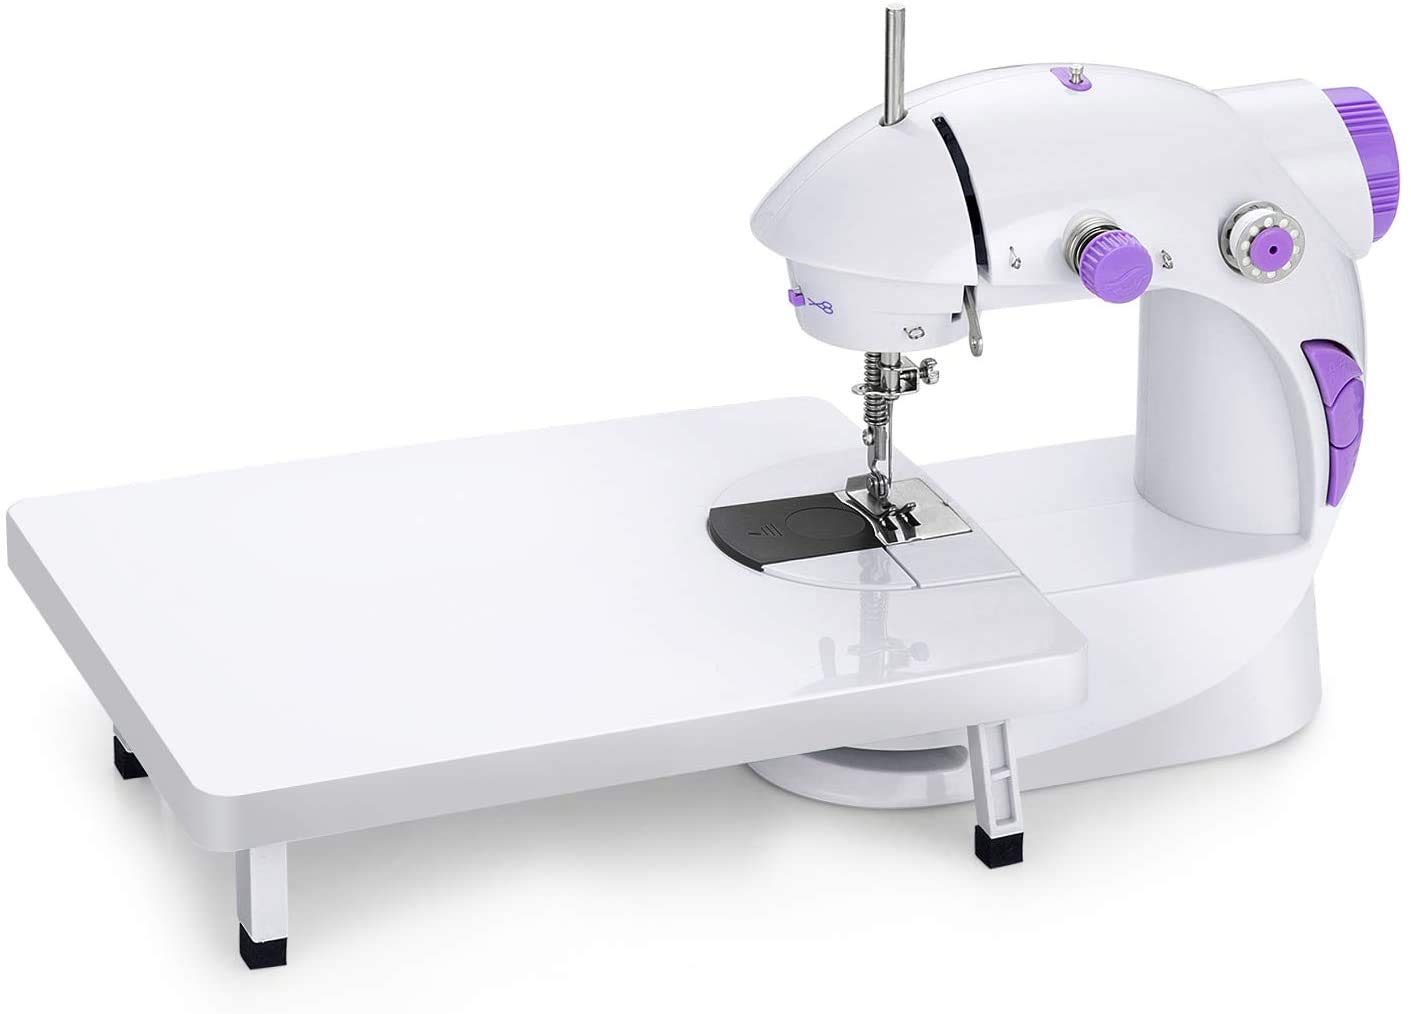 Qualimate Portable Mini Sewing Machine